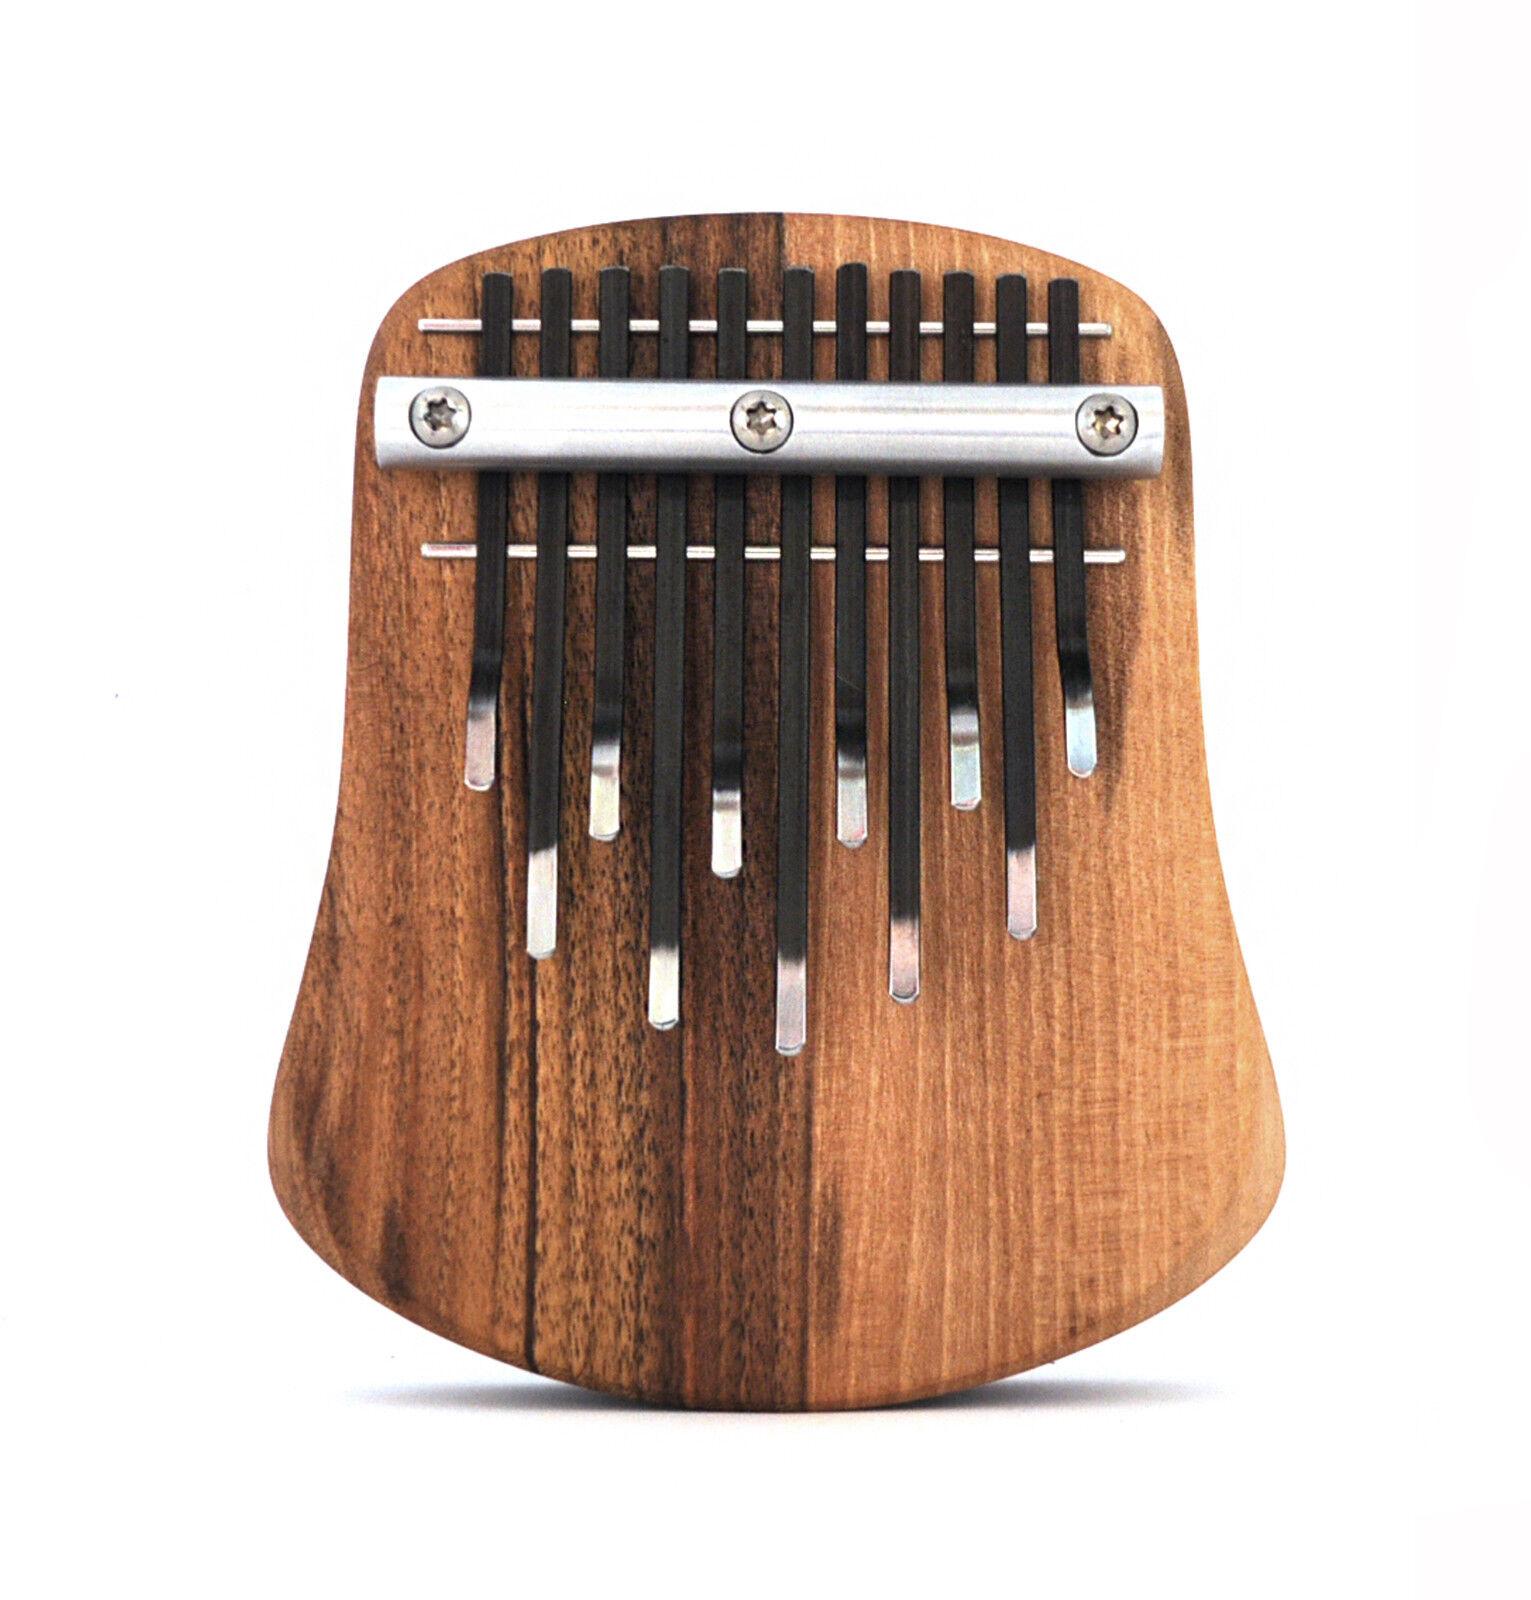 Thumb piano - 11 tone kalimba PYRA on the resonance desk in pentatonic tuning